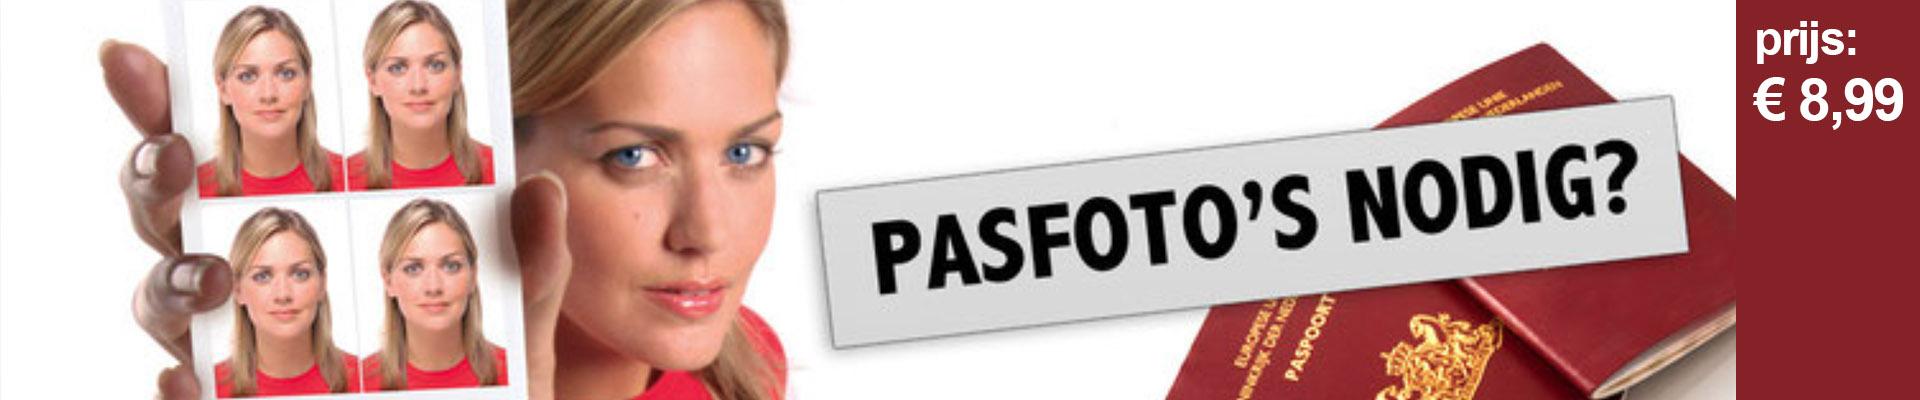 Slider-pasfotokopie